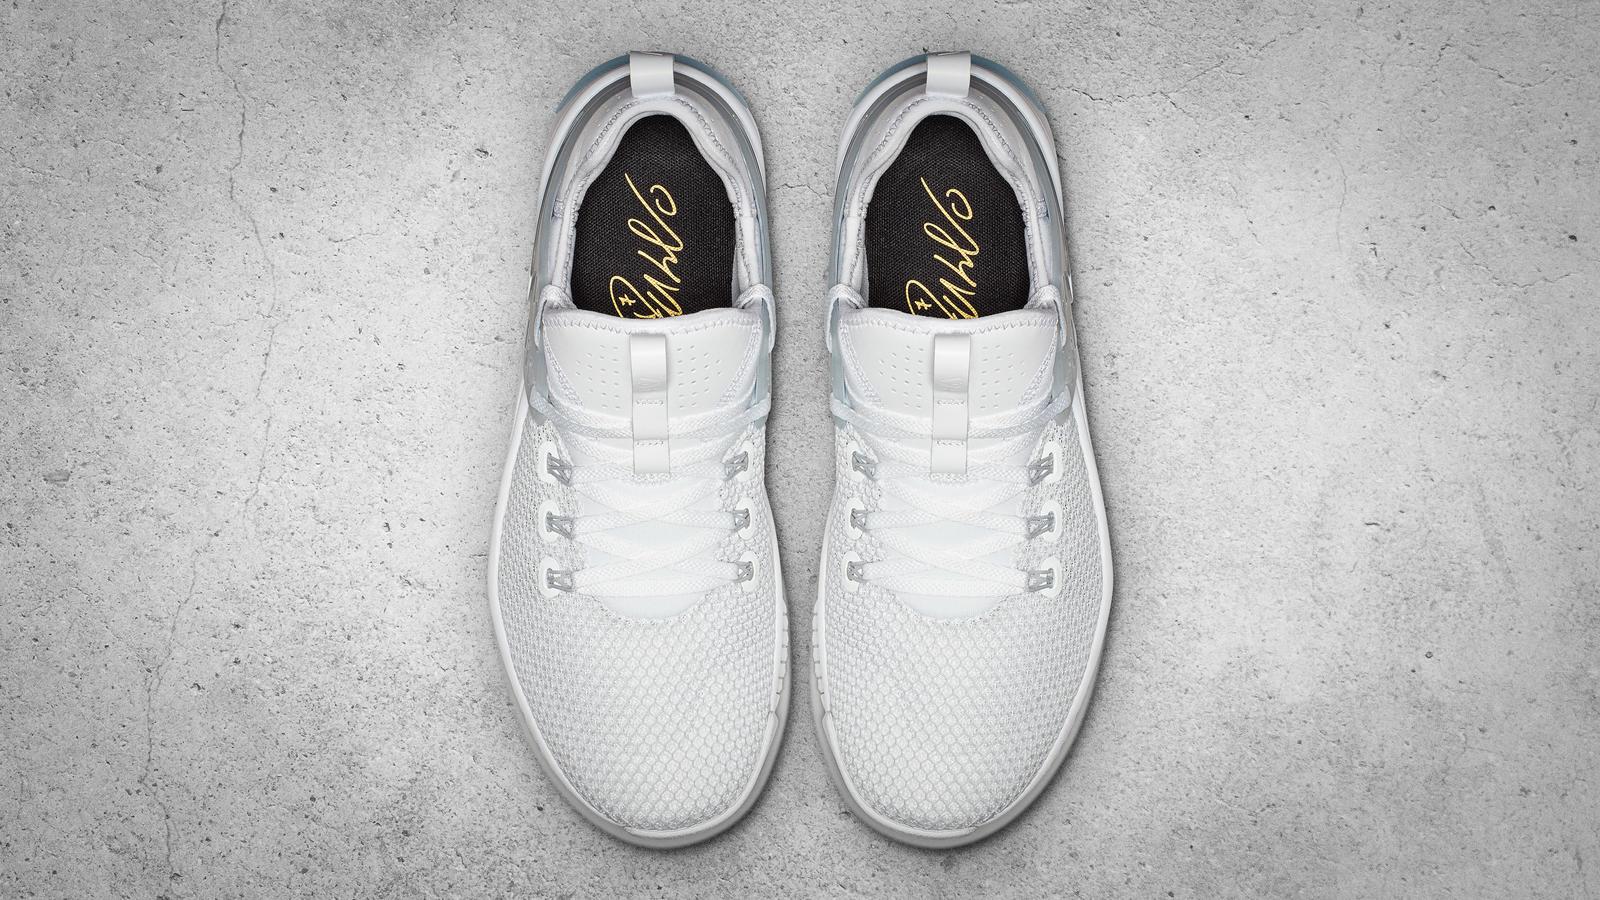 29f8bcf79ac8 Nike Free CR7 x Metcon - Nike News